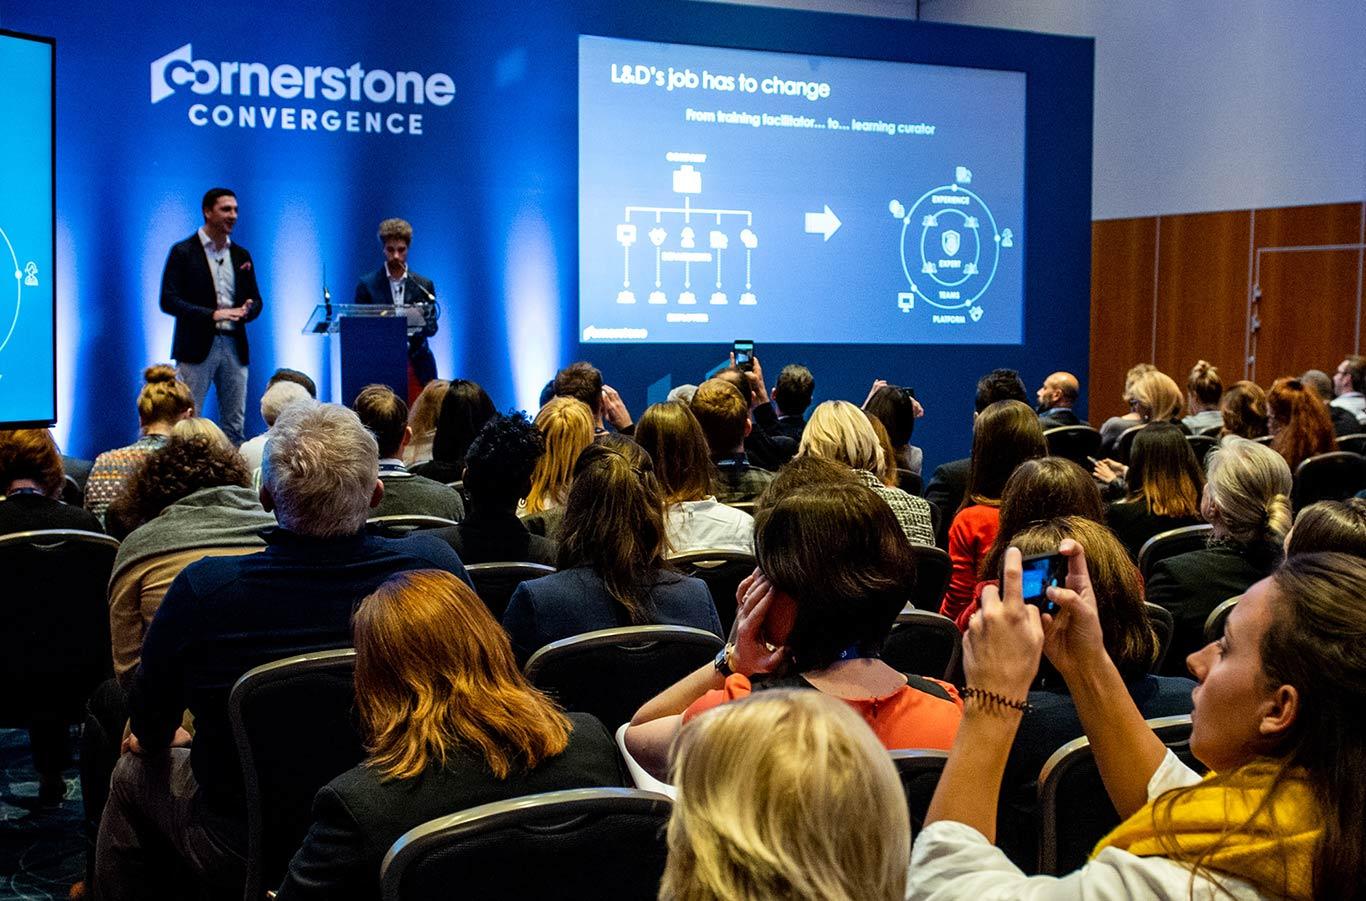 Cornerstone konferens.